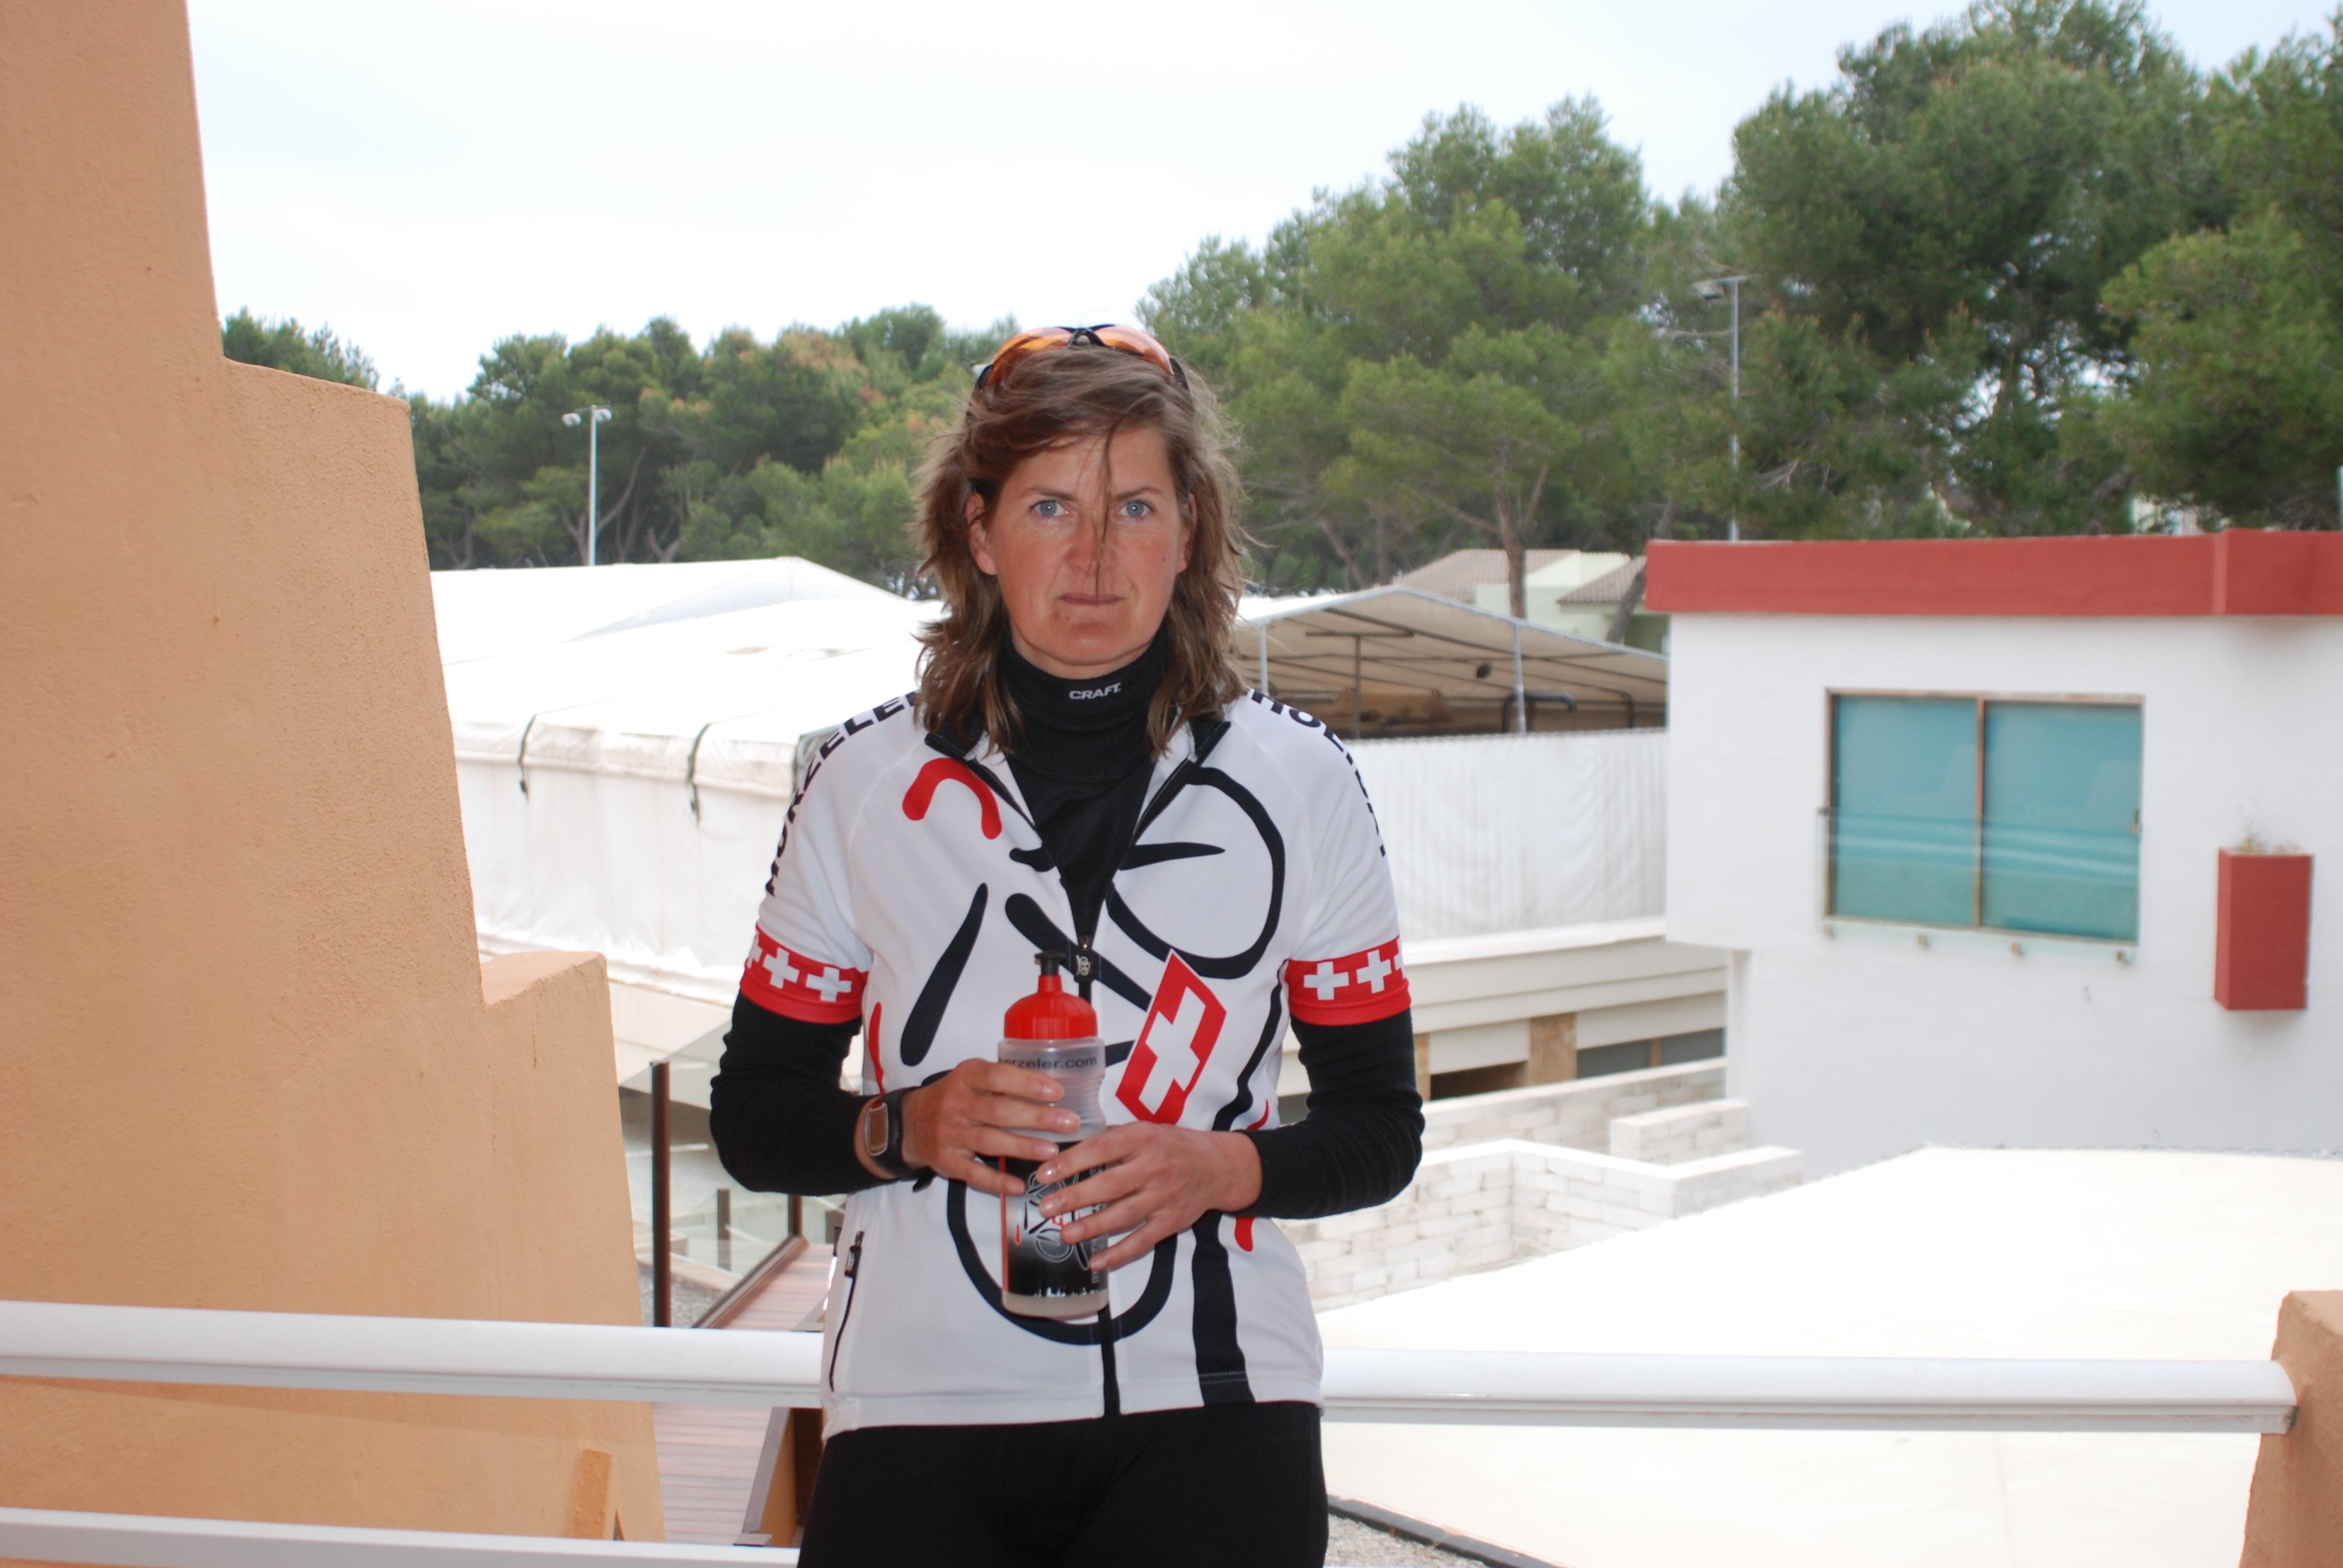 Rennrad fahren Playa de Muro